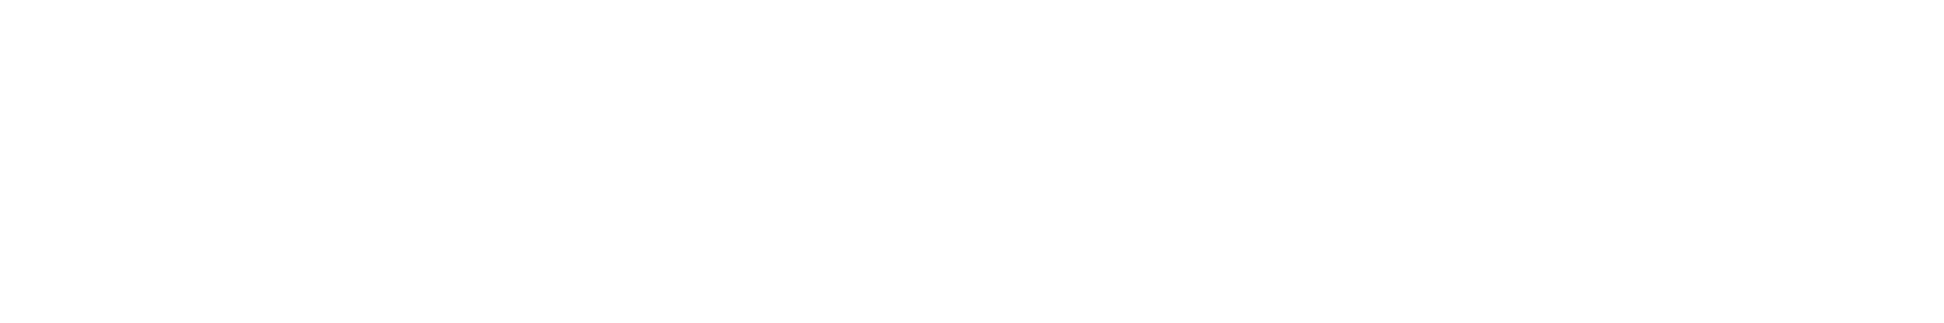 Crossroads Online Campus